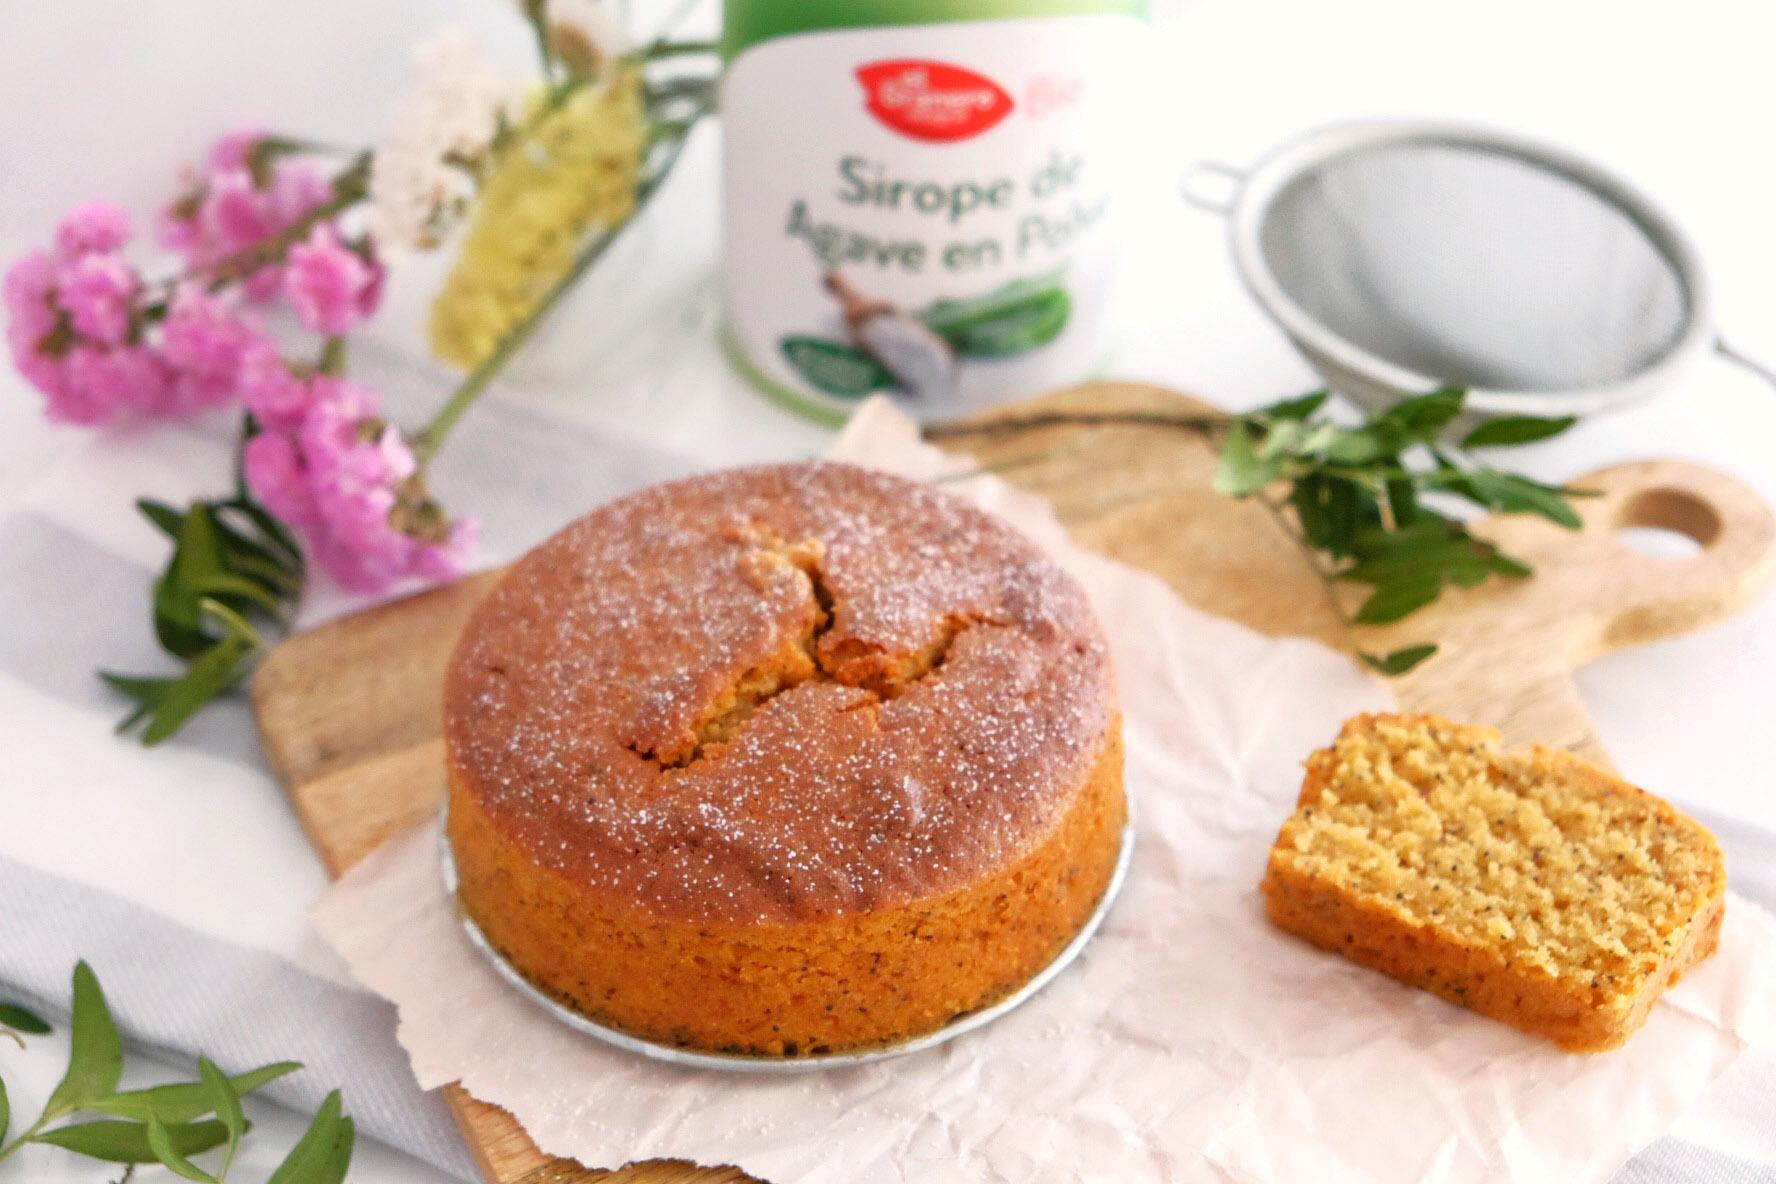 Gluten-free lemon cake with poppy seeds